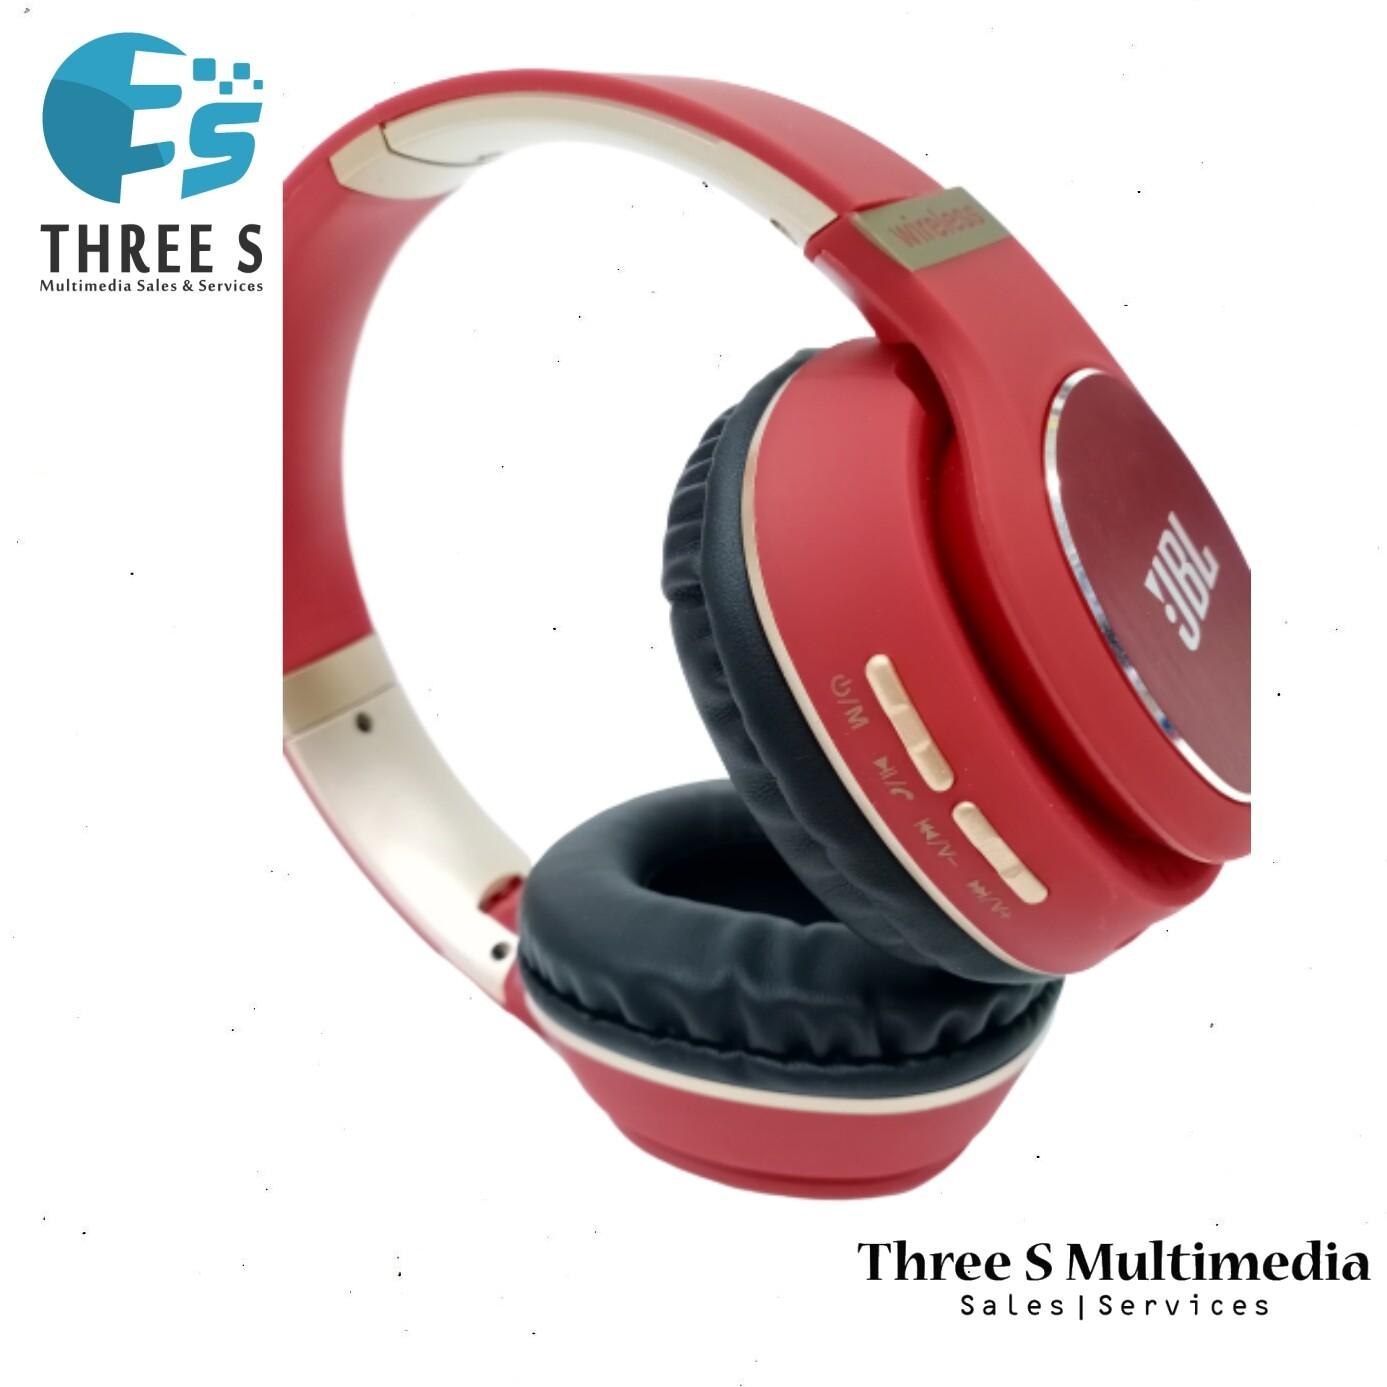 JBL STEREO HEADPHONE MDR-850 EXTRA BASS